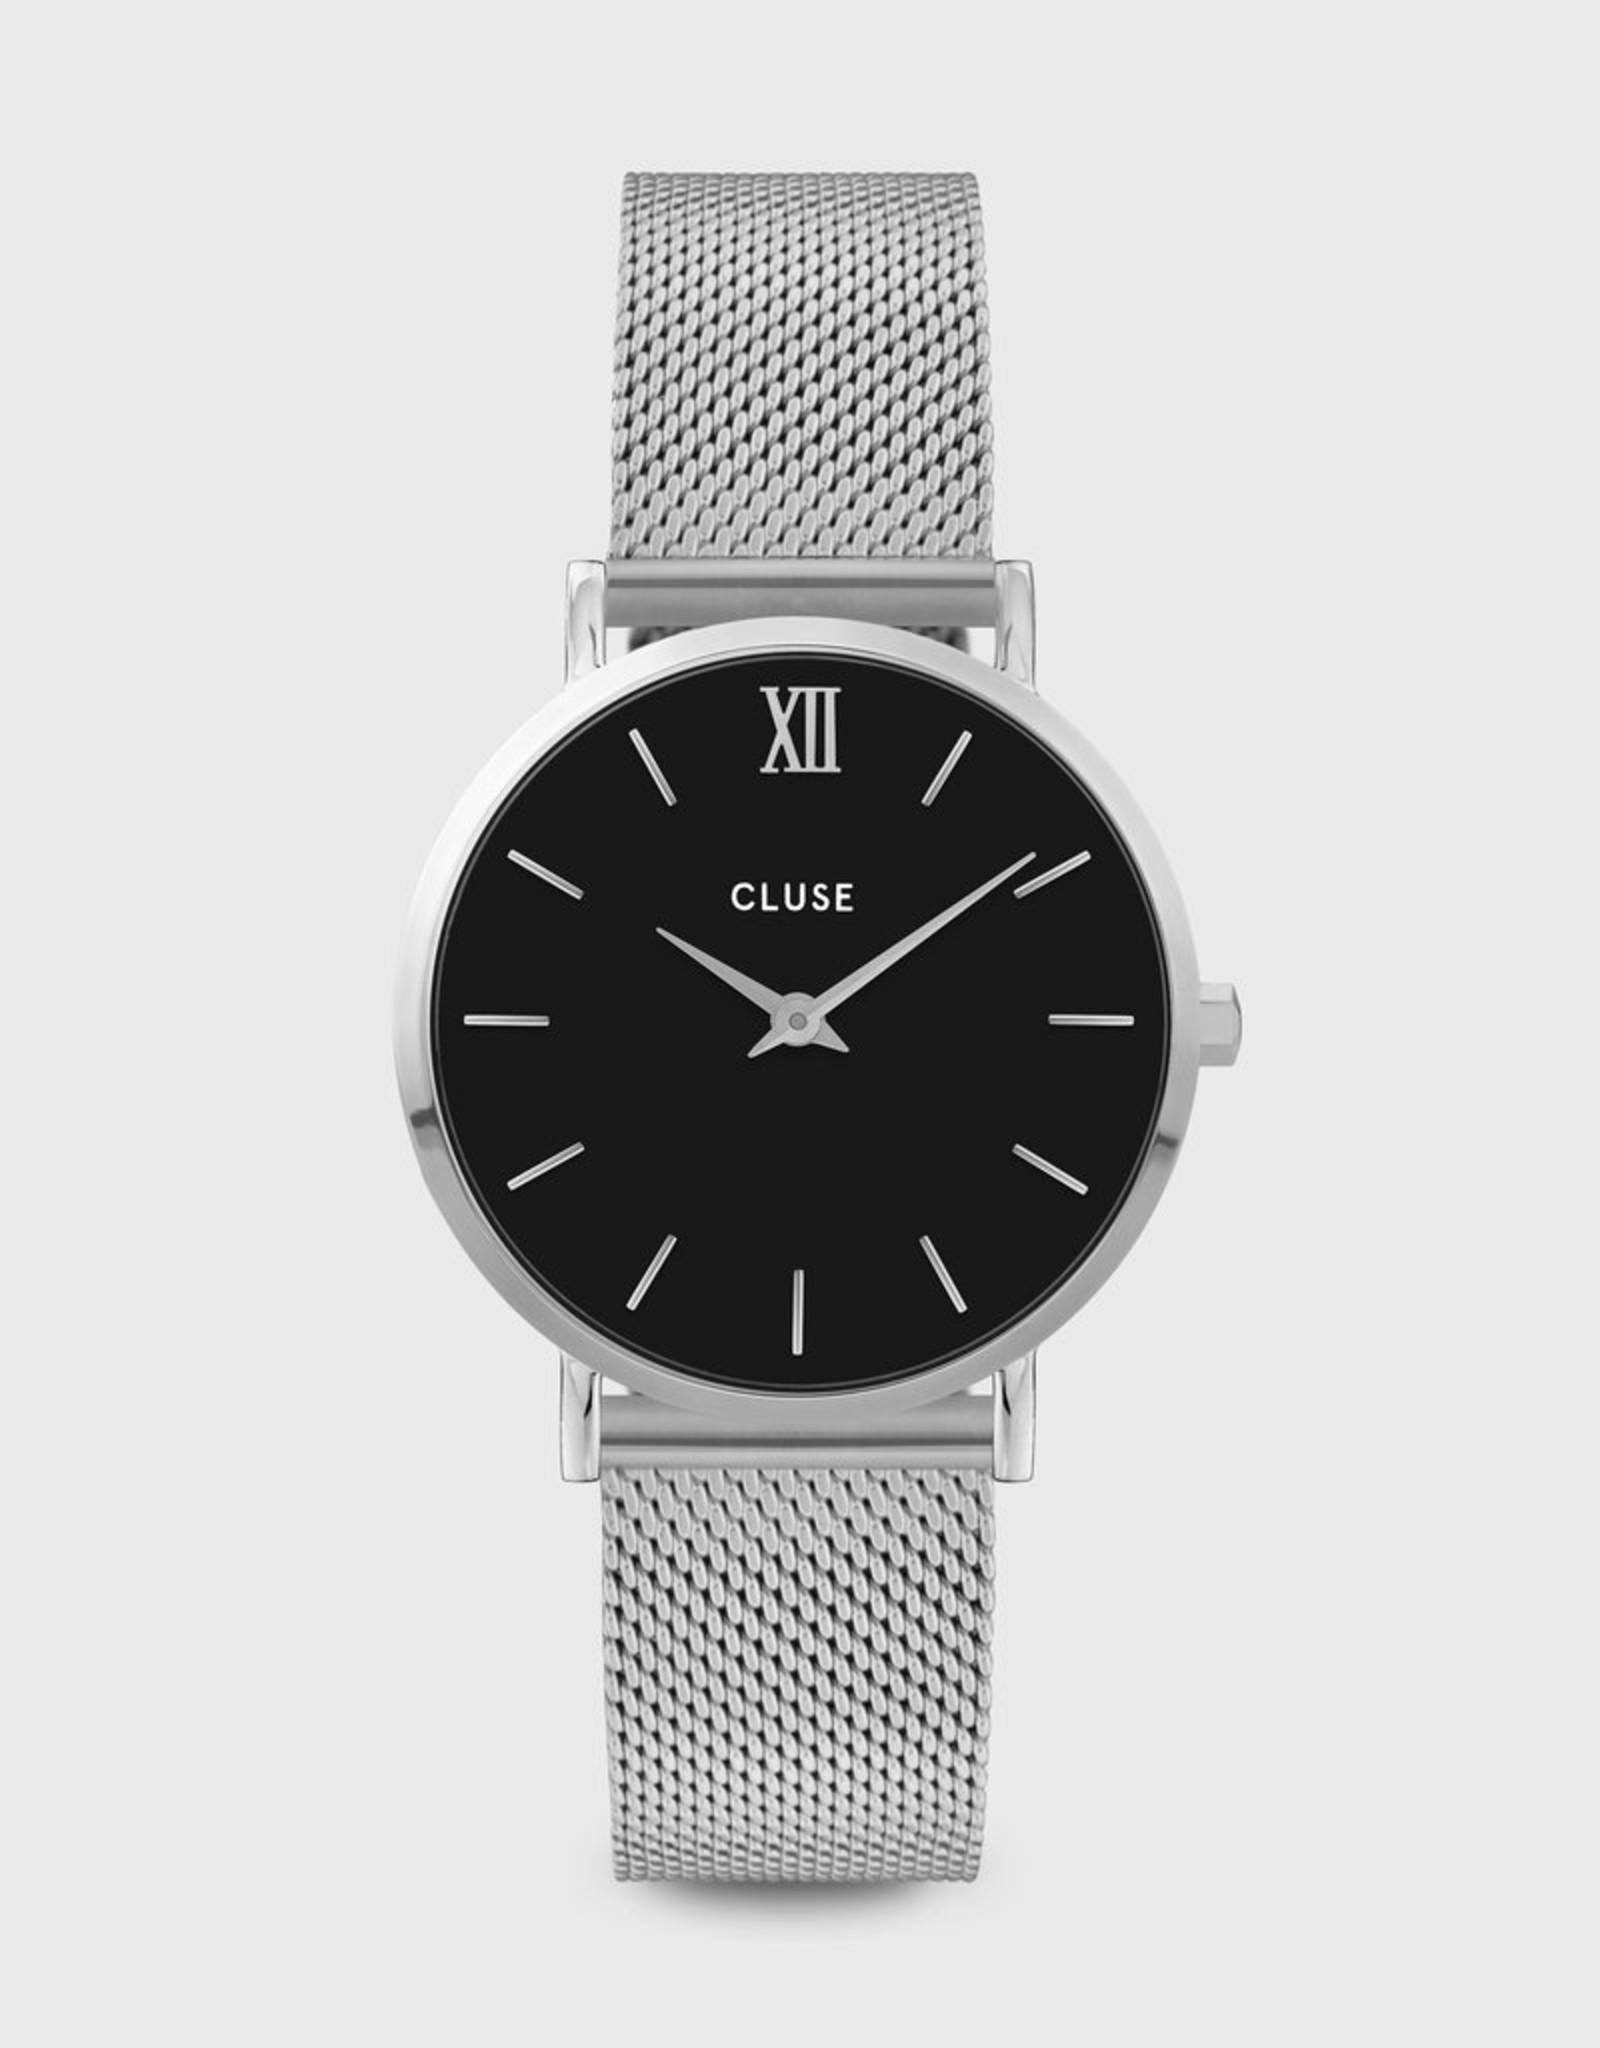 Cluse Minuit Mesh, Silver, Black/Silver